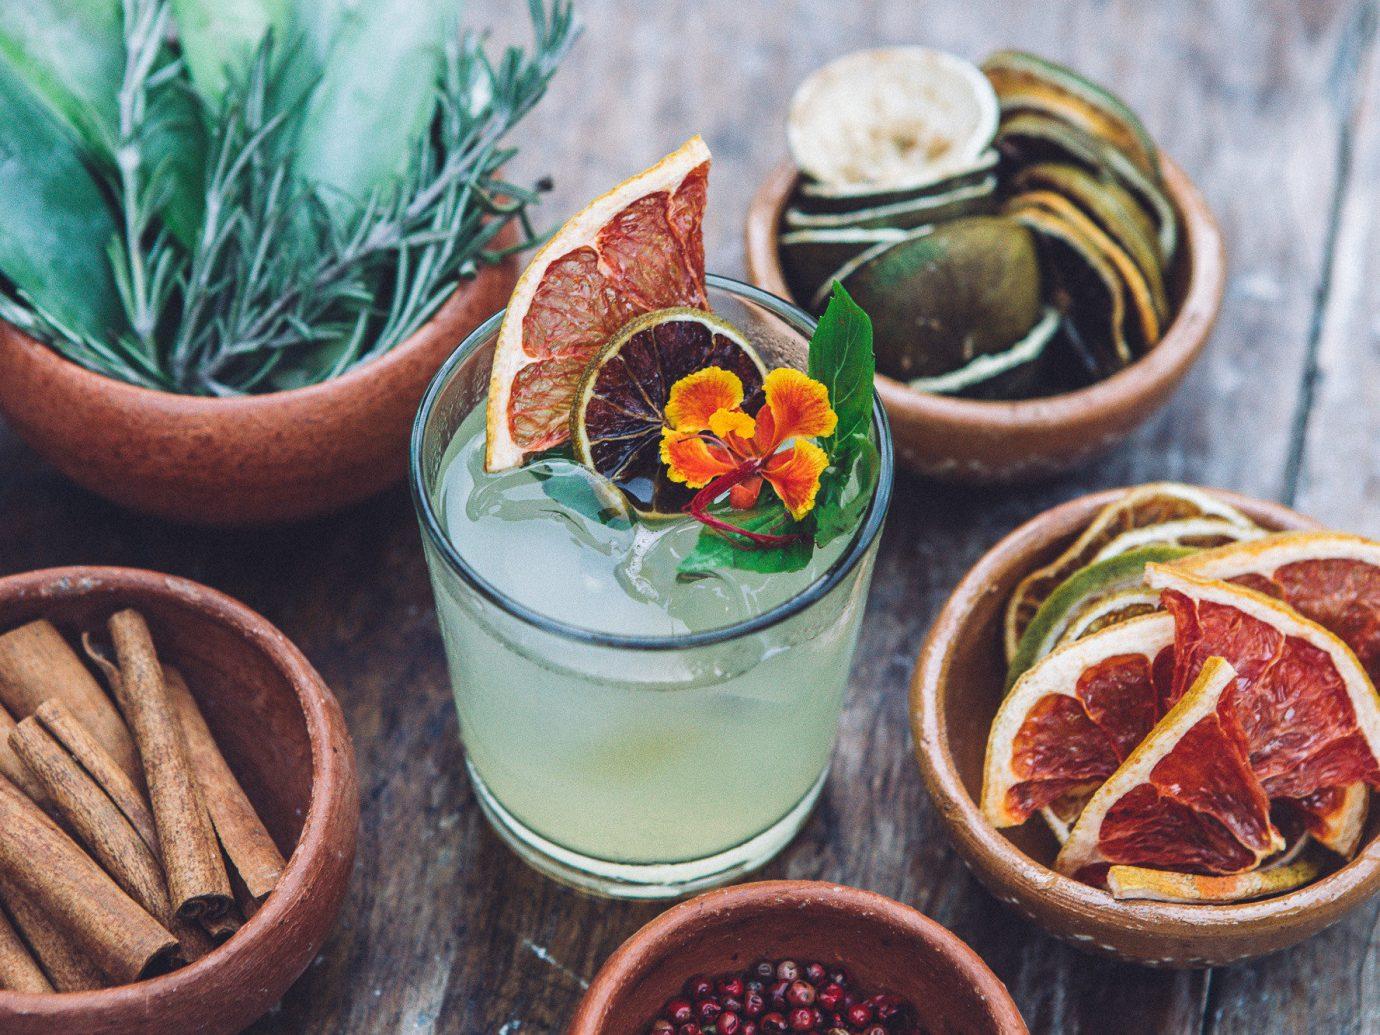 Trip Ideas food dish fruit plant meal produce breakfast cuisine flavor